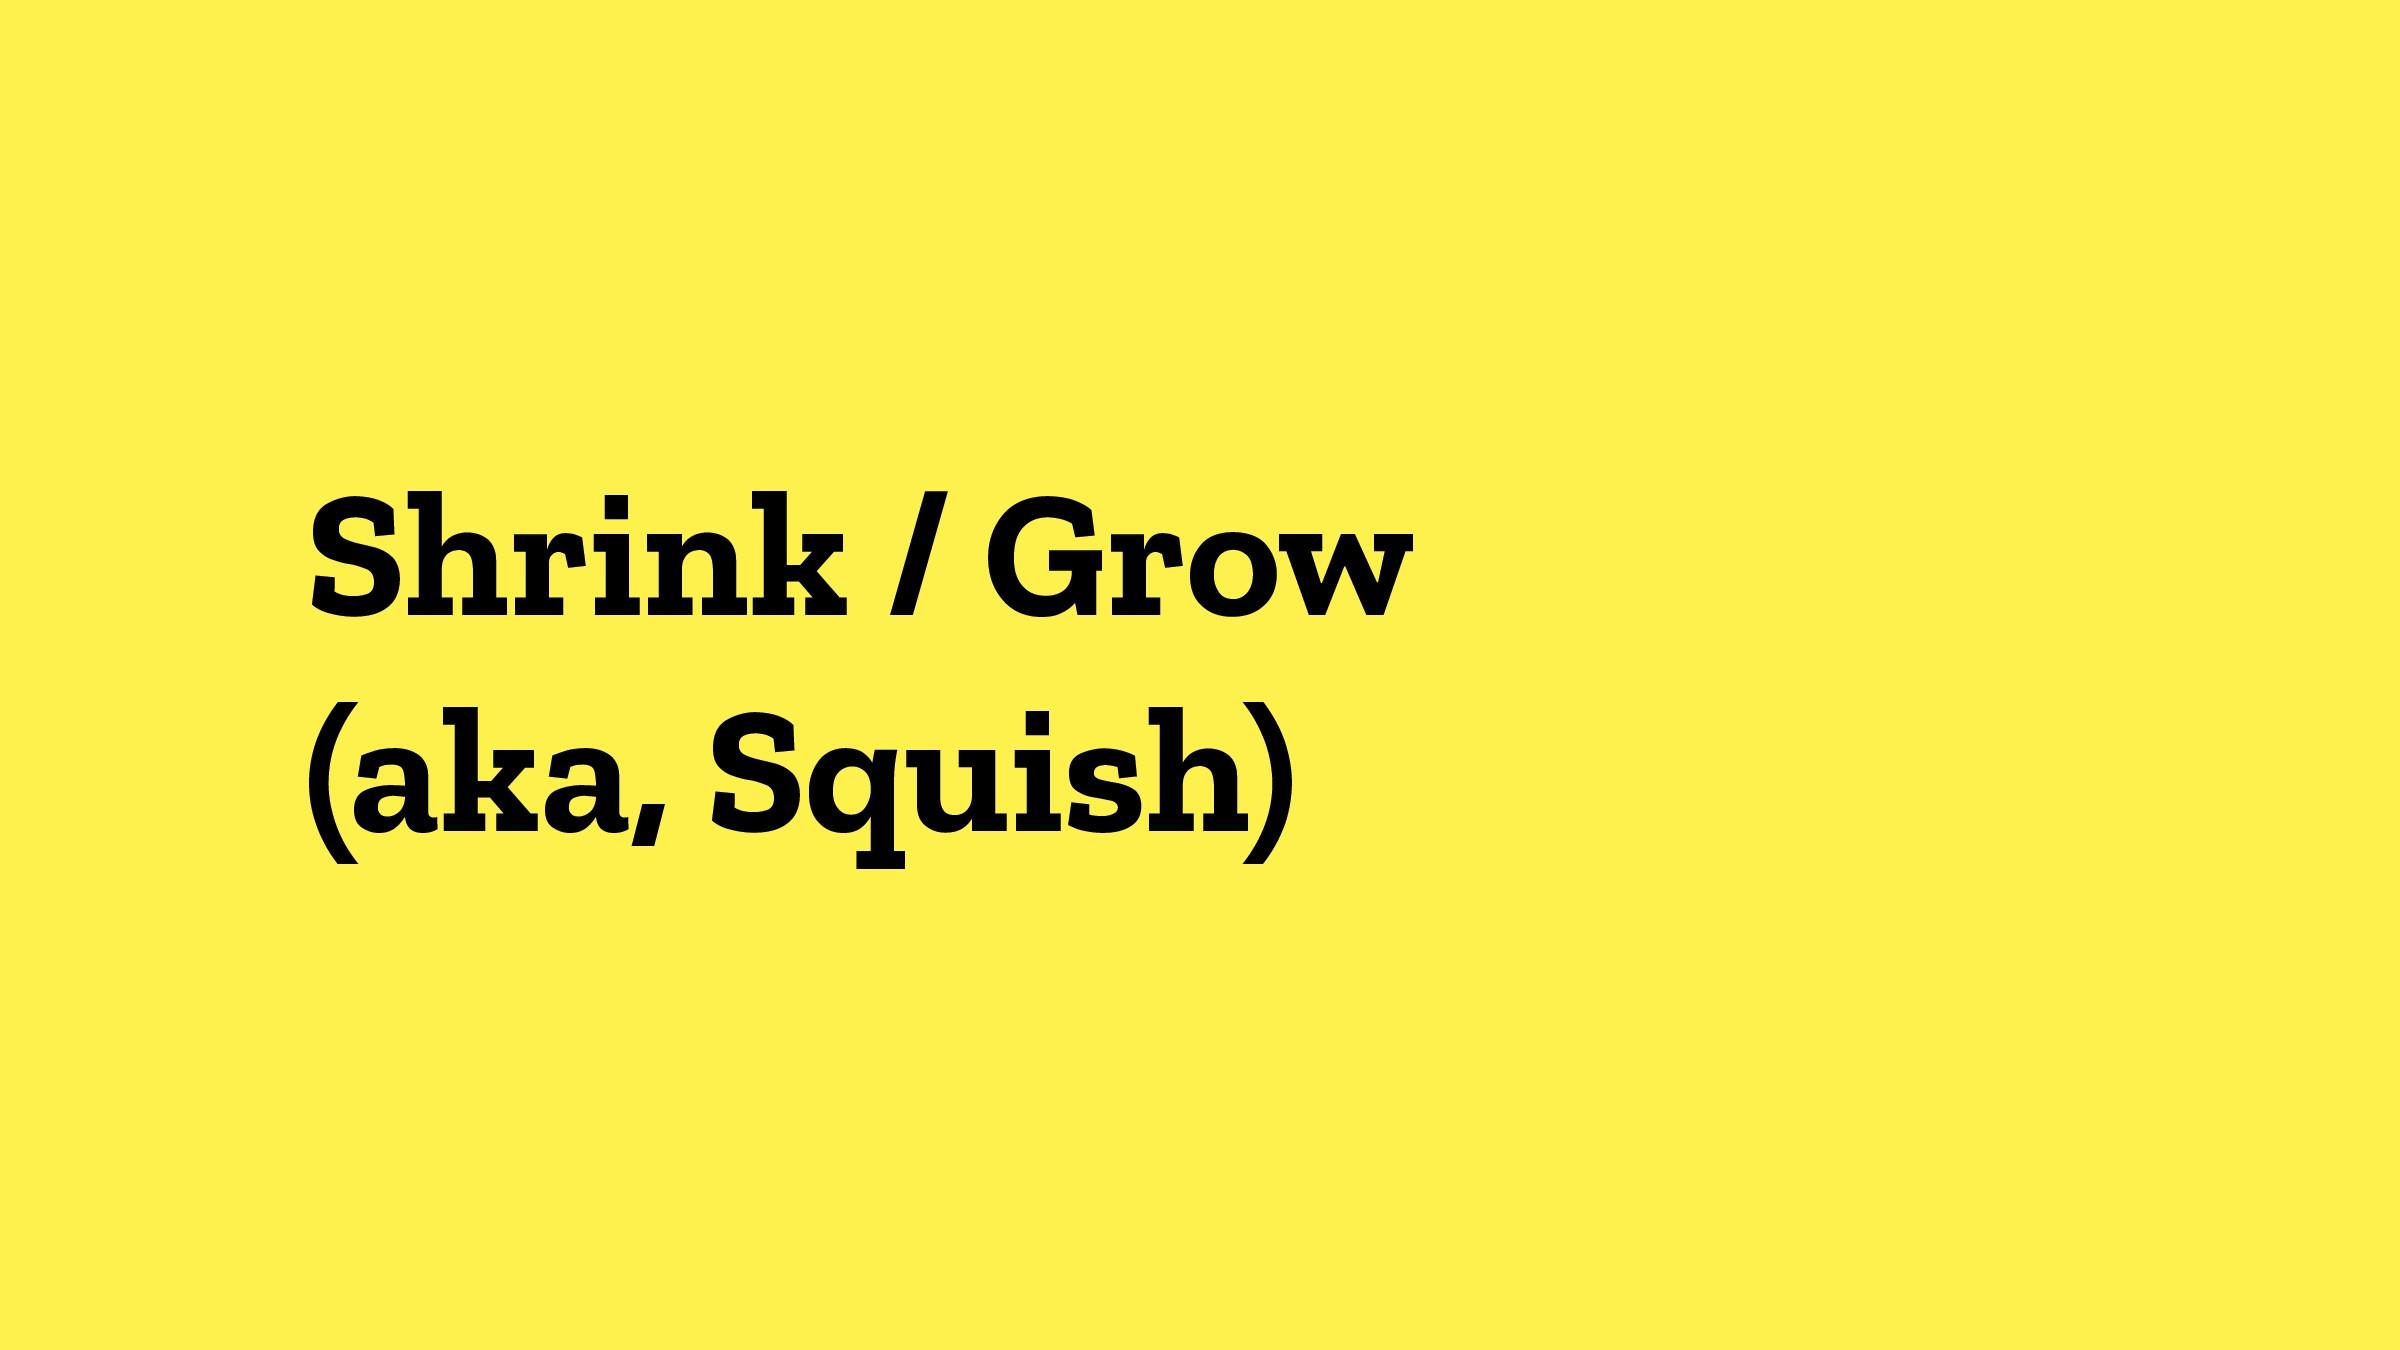 Shrink / Grow (aka, Squish)